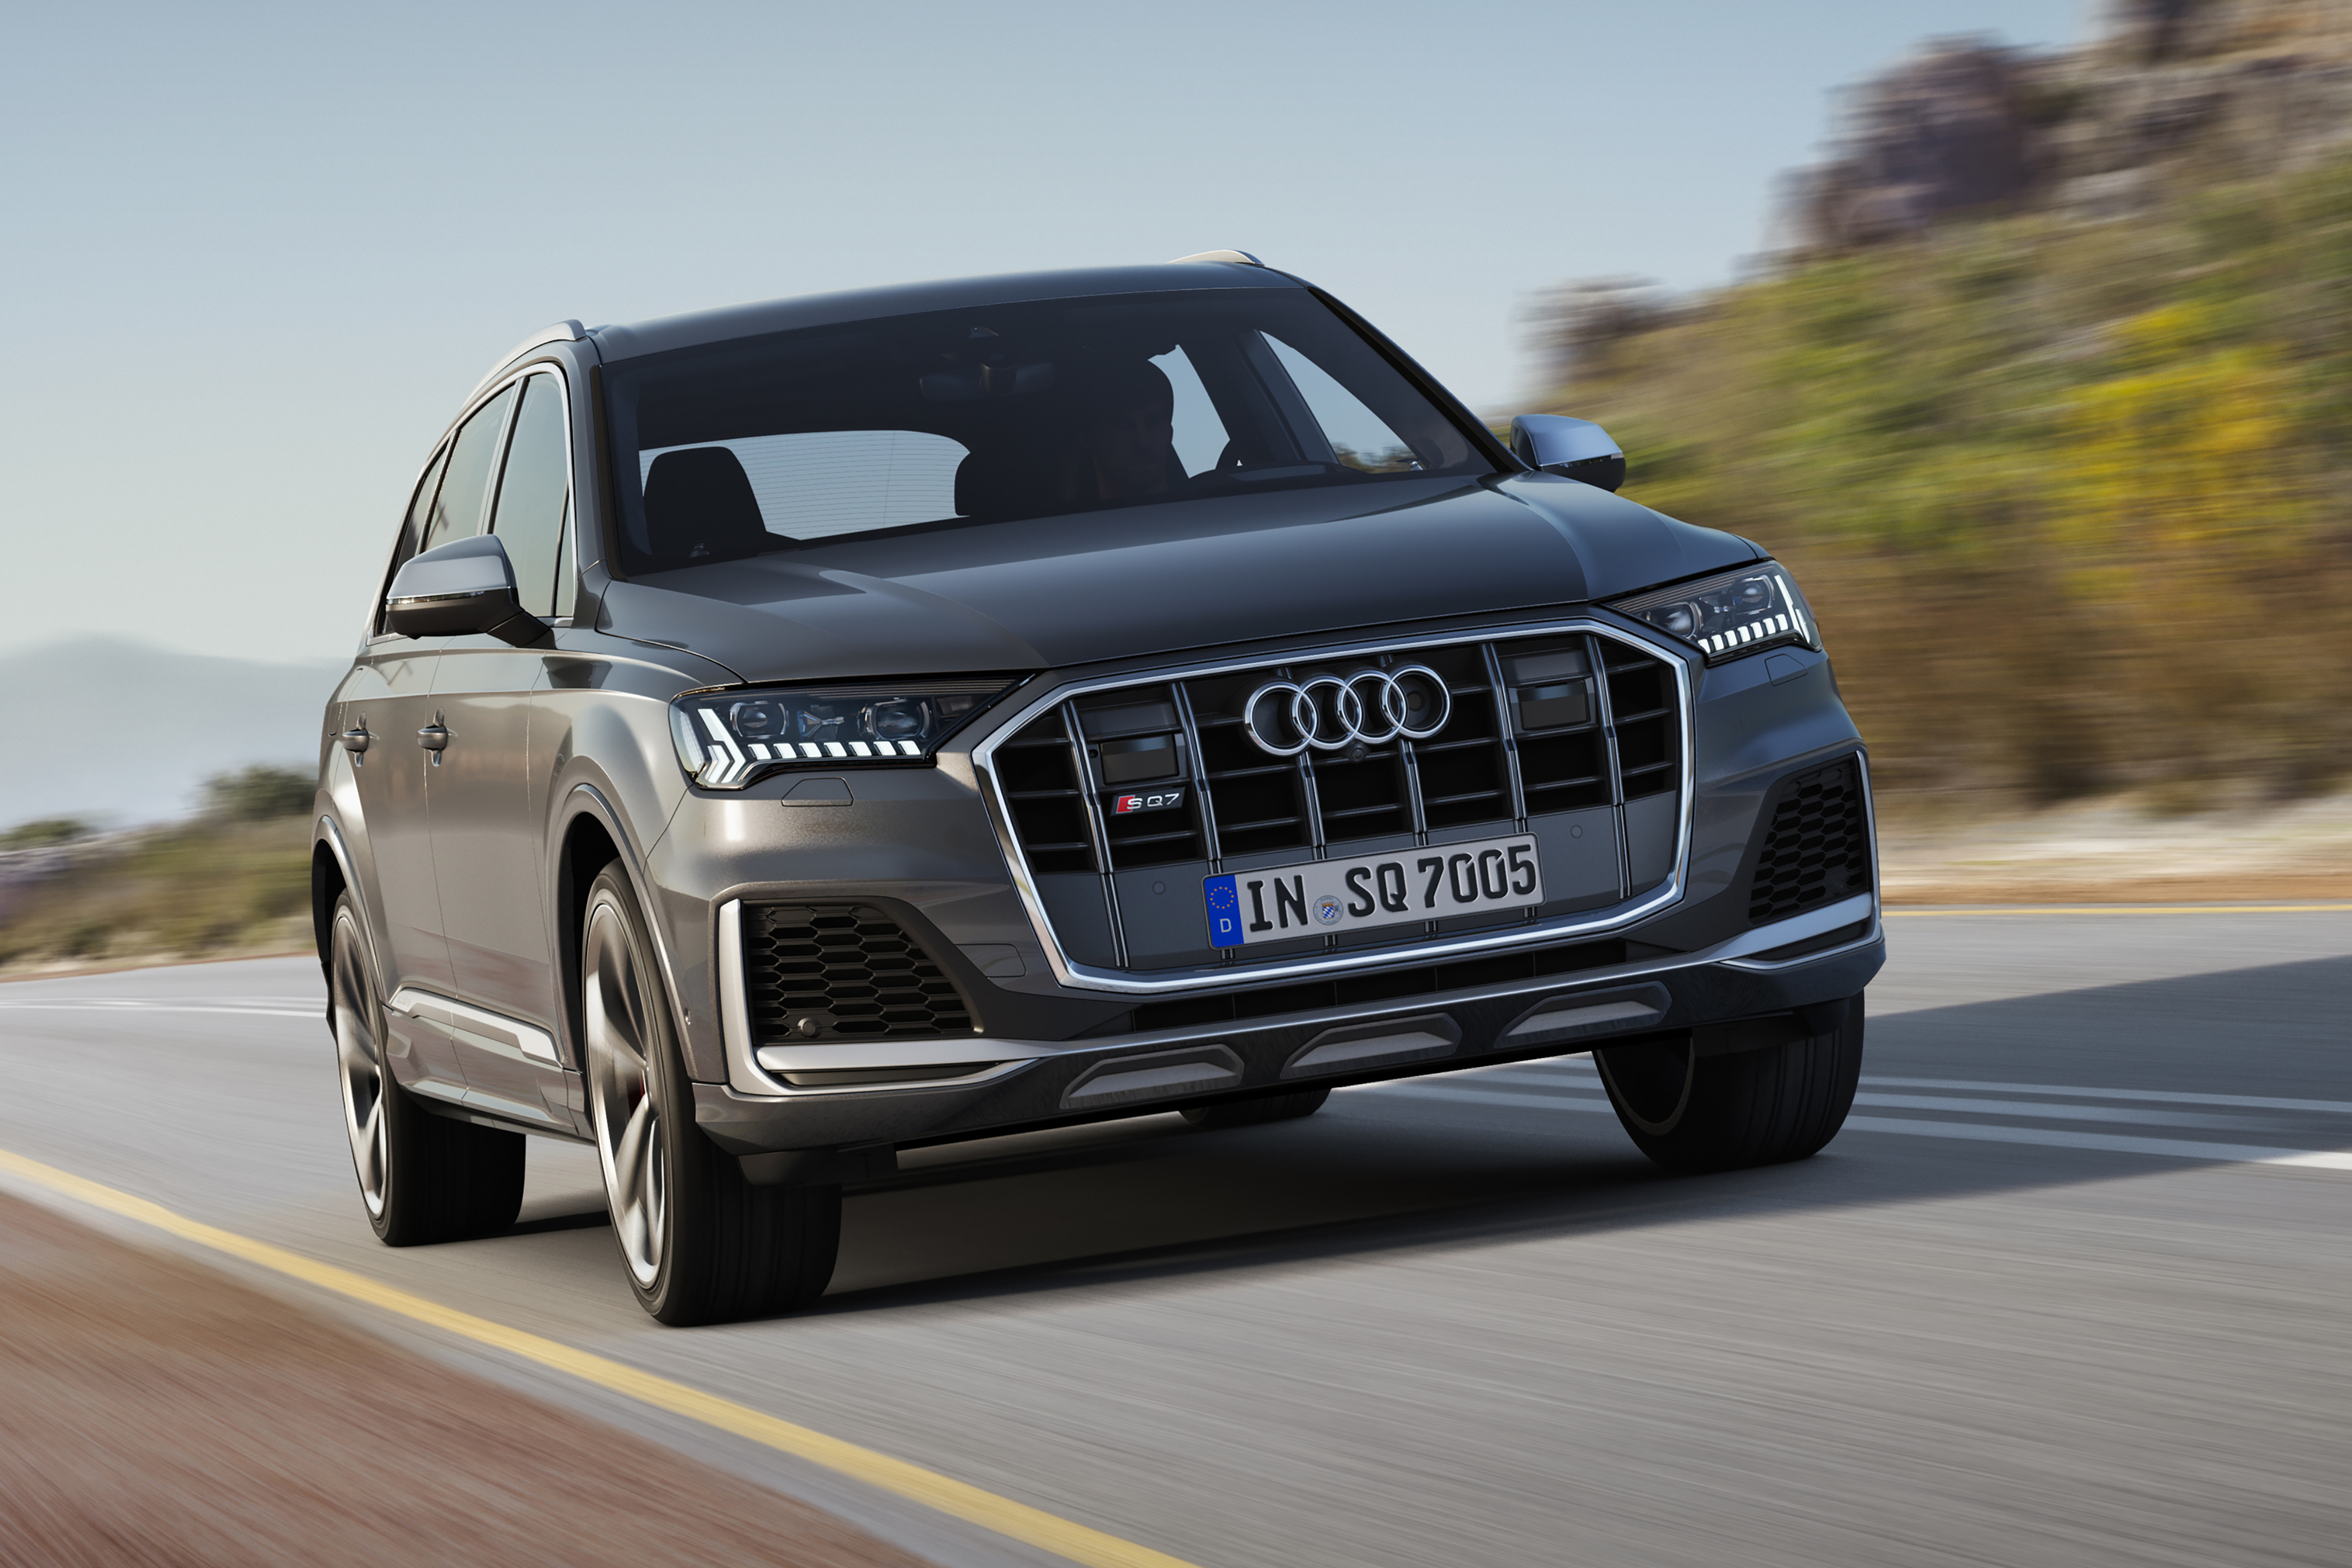 2020 Audi SQ7 OEM